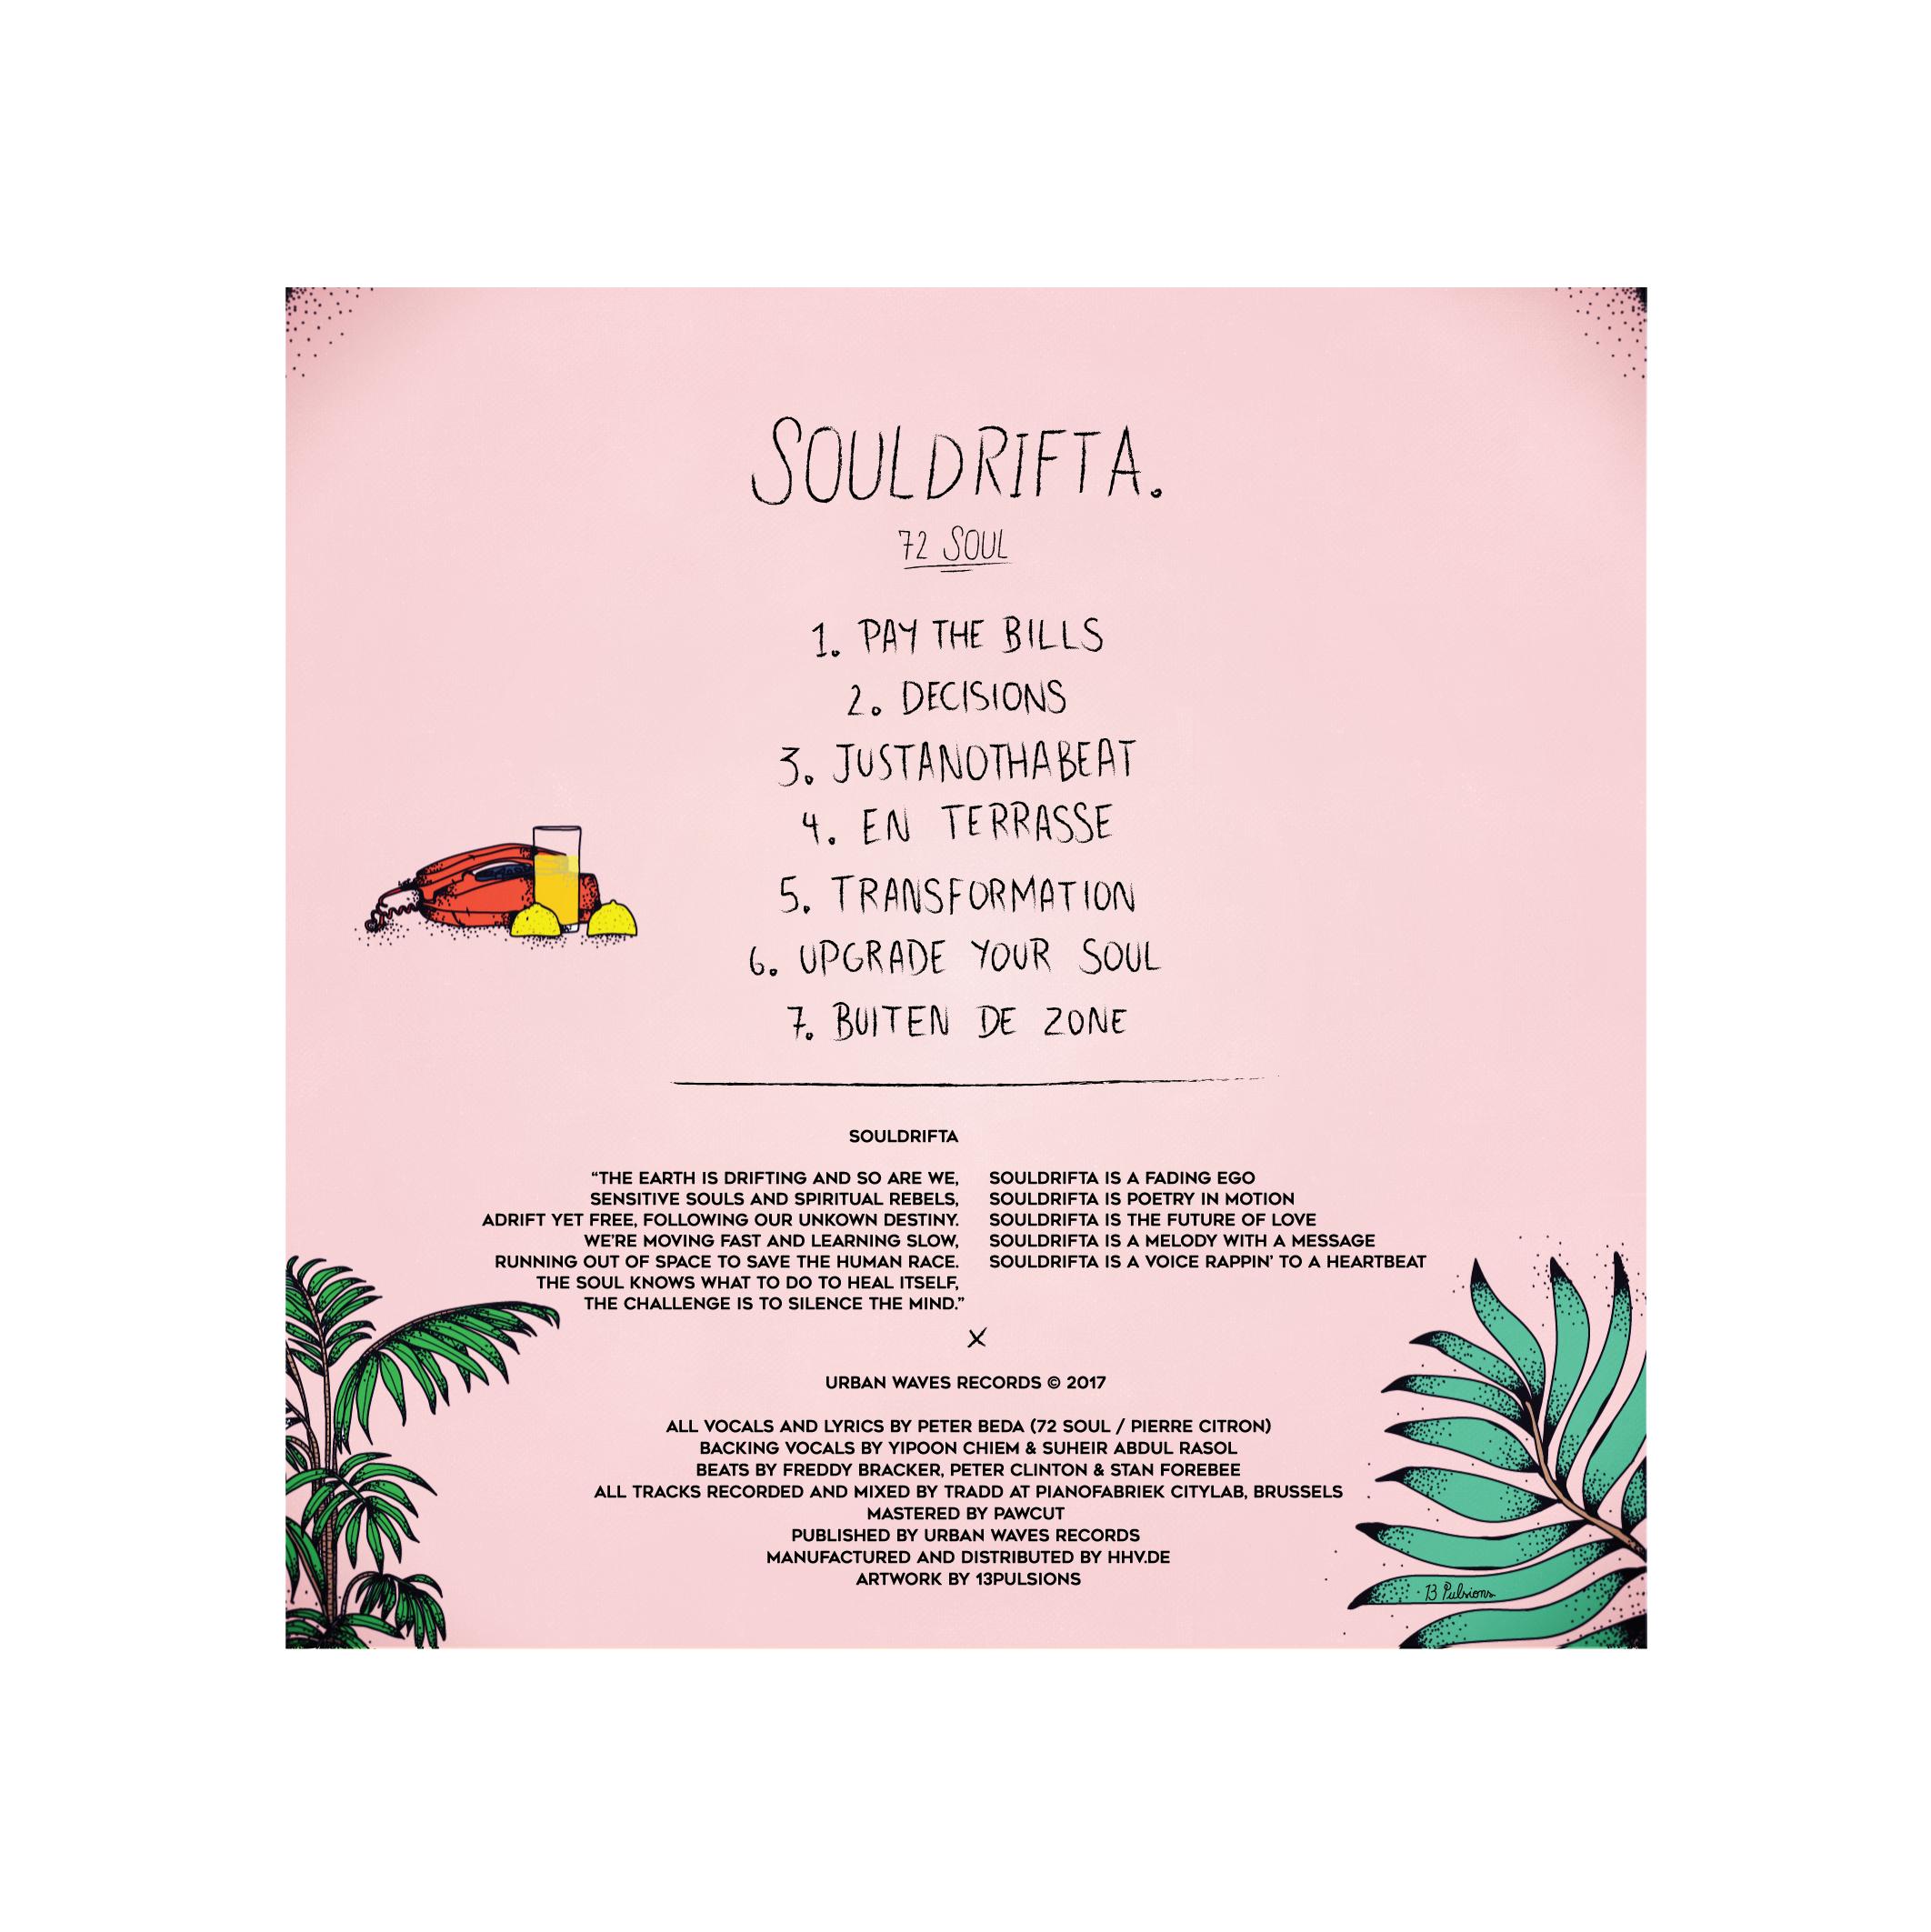 72-SOUL-SOULDRIFTA-BACK